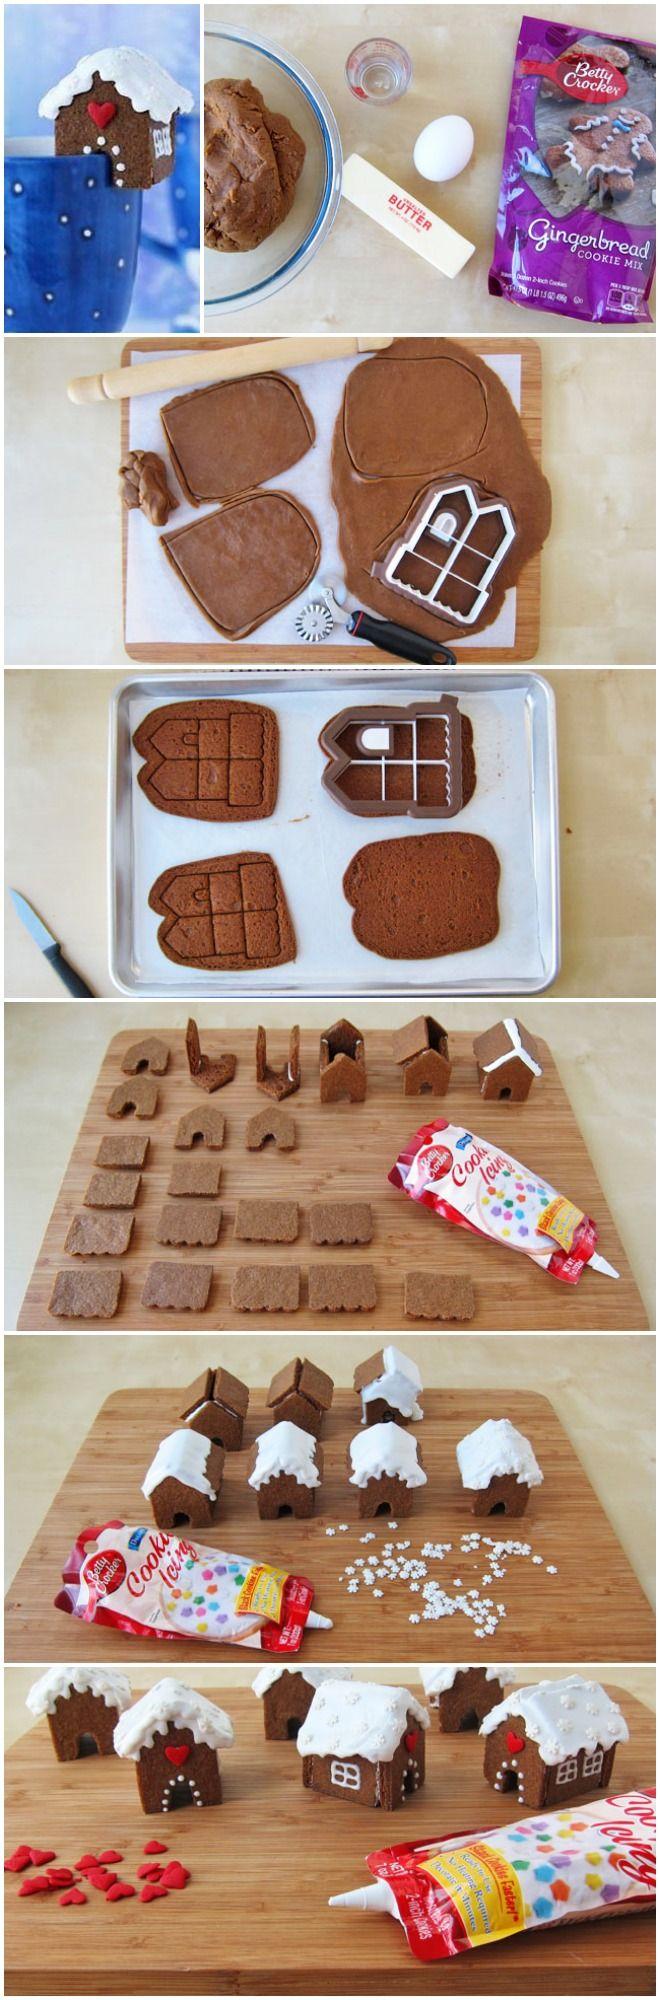 Mini Gingerbread Houses! #omg #mini #gingerbread #christmas